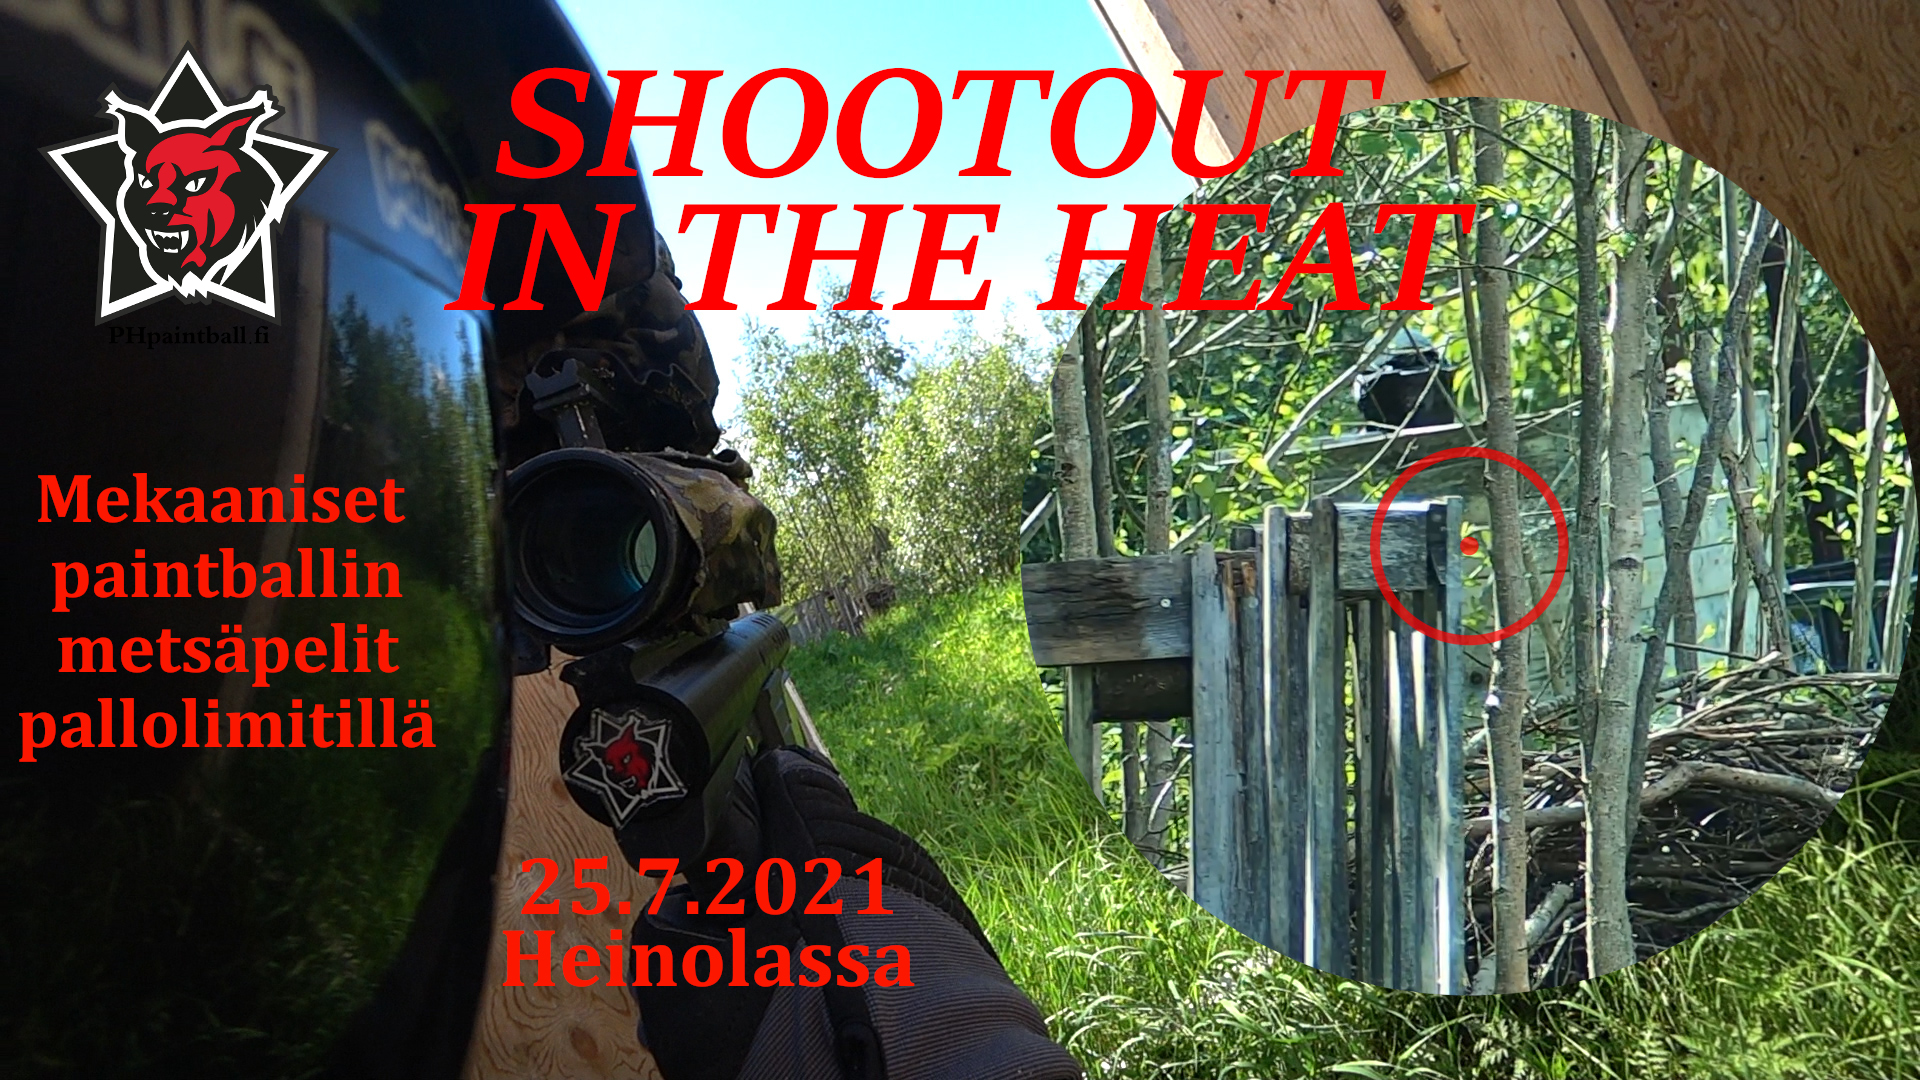 shootoutintheheat_2021.jpg